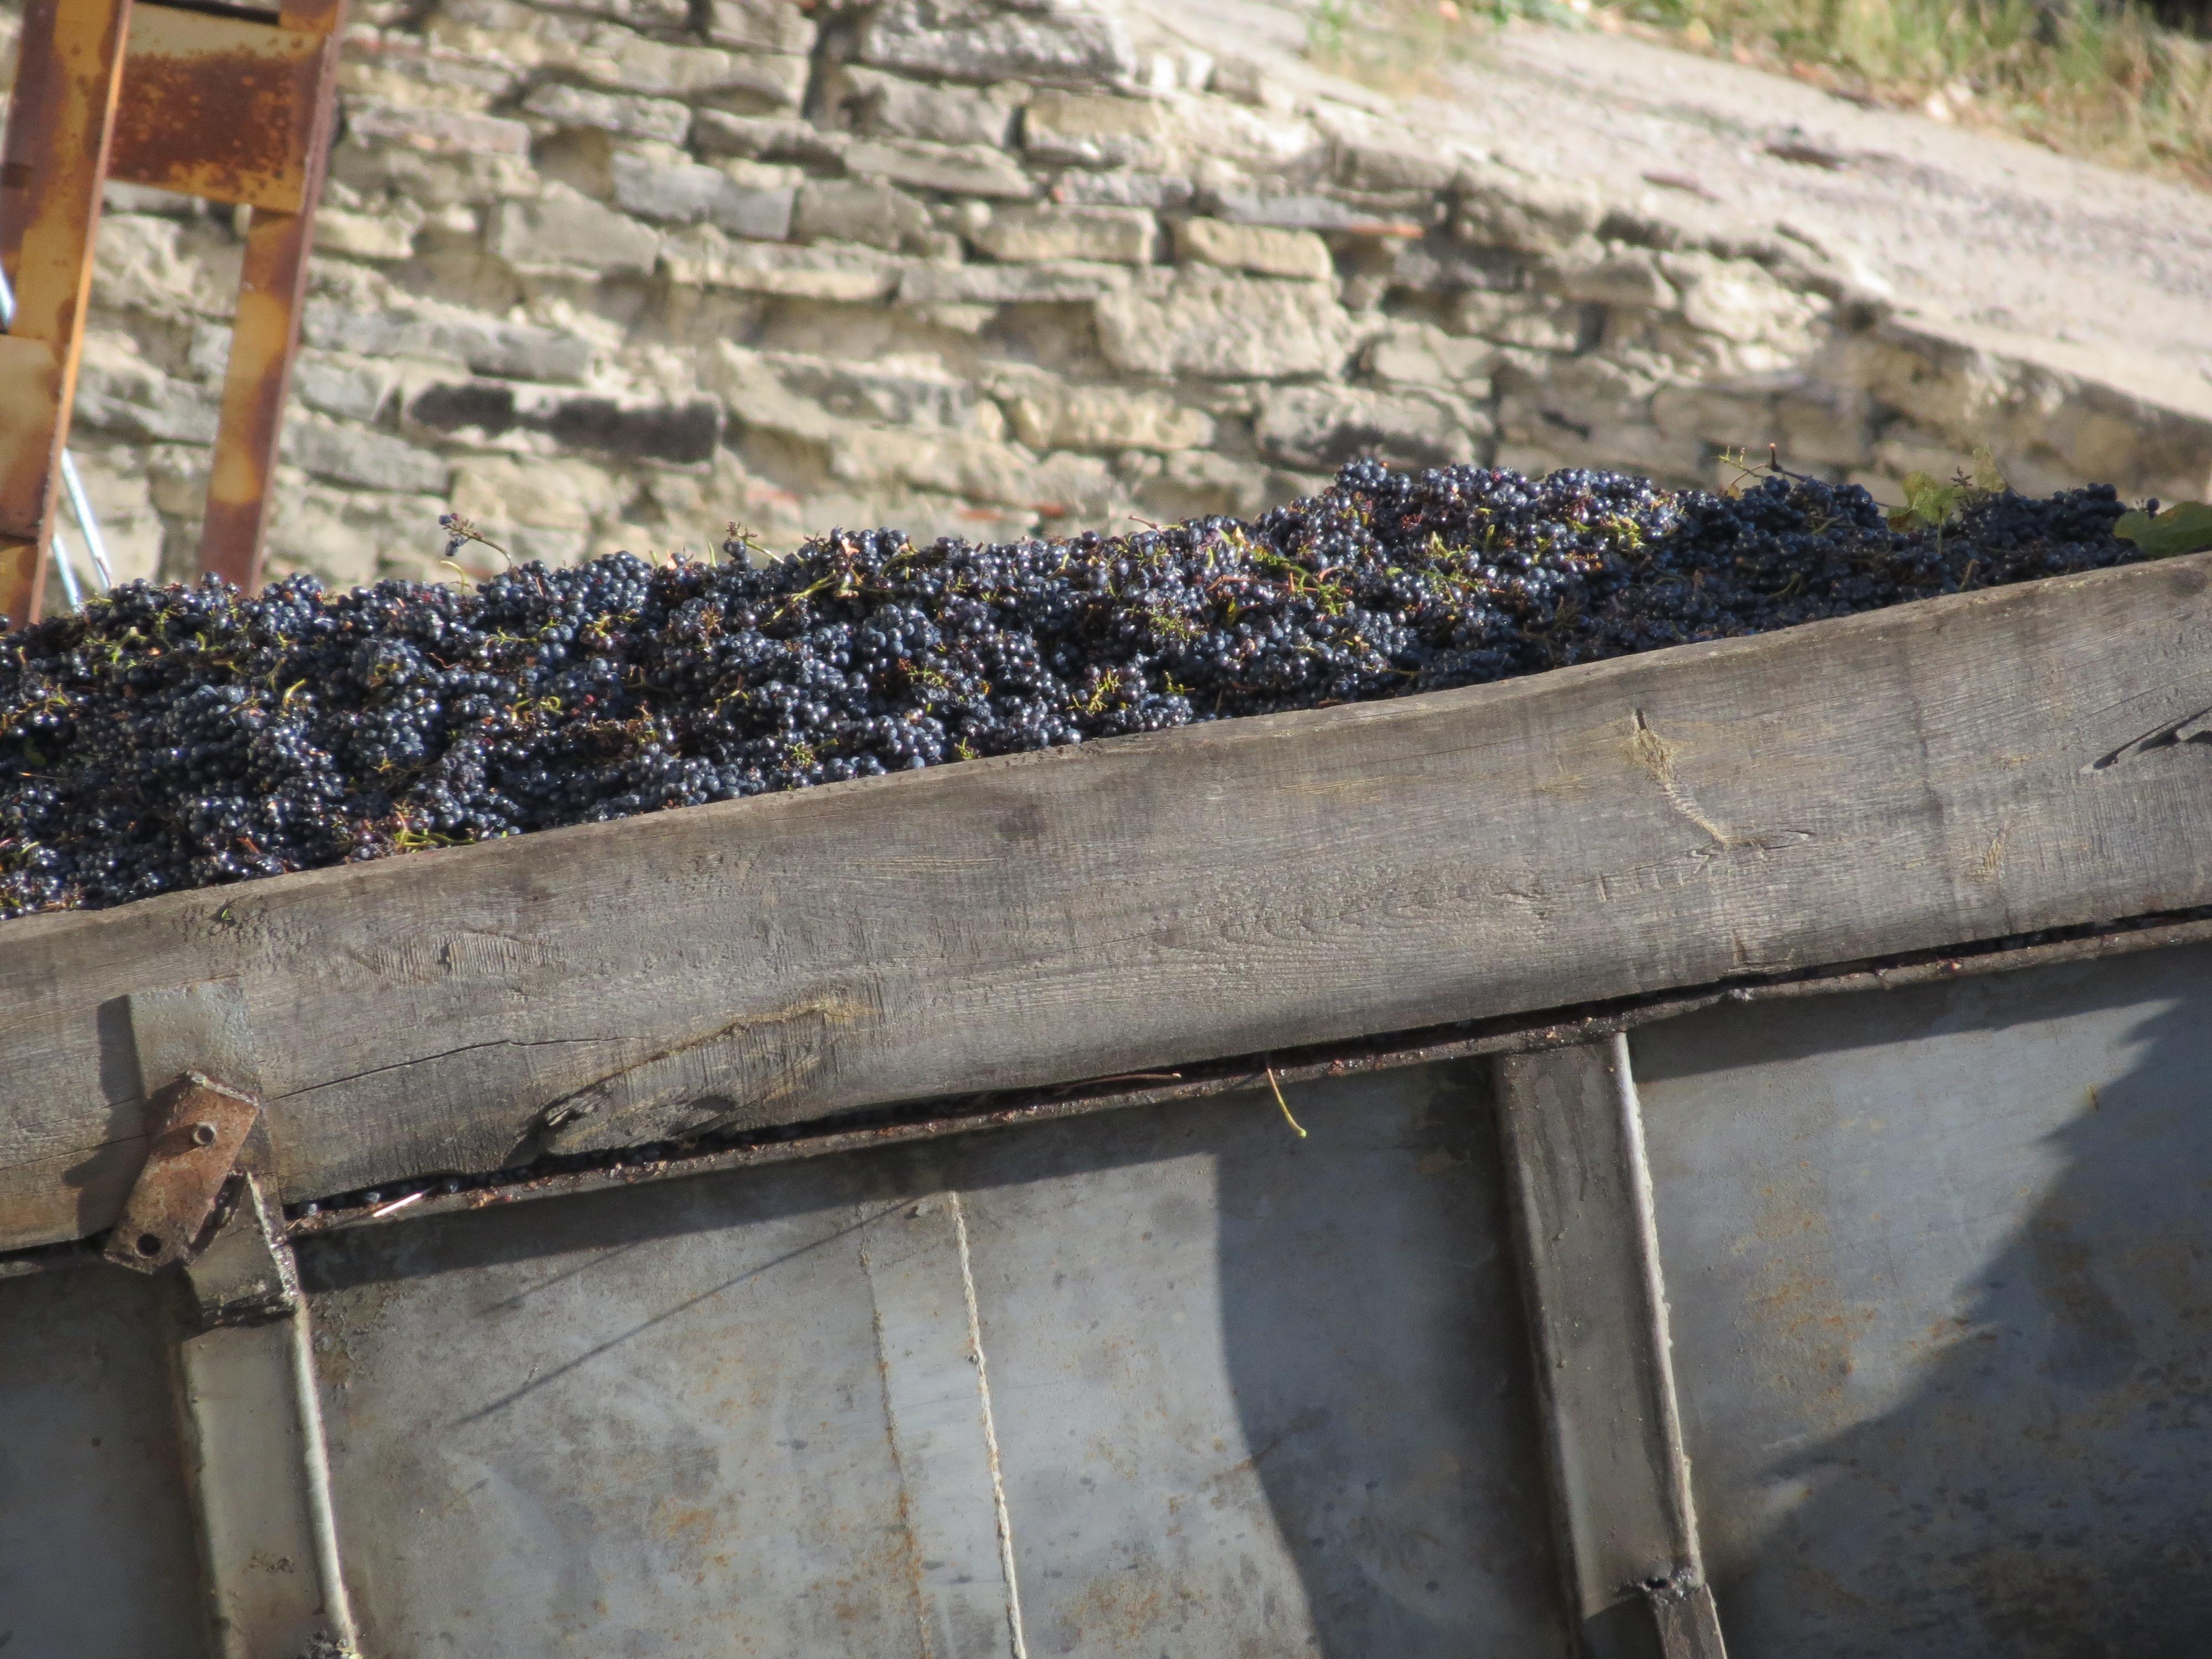 Garling Winery Sept 24 2014